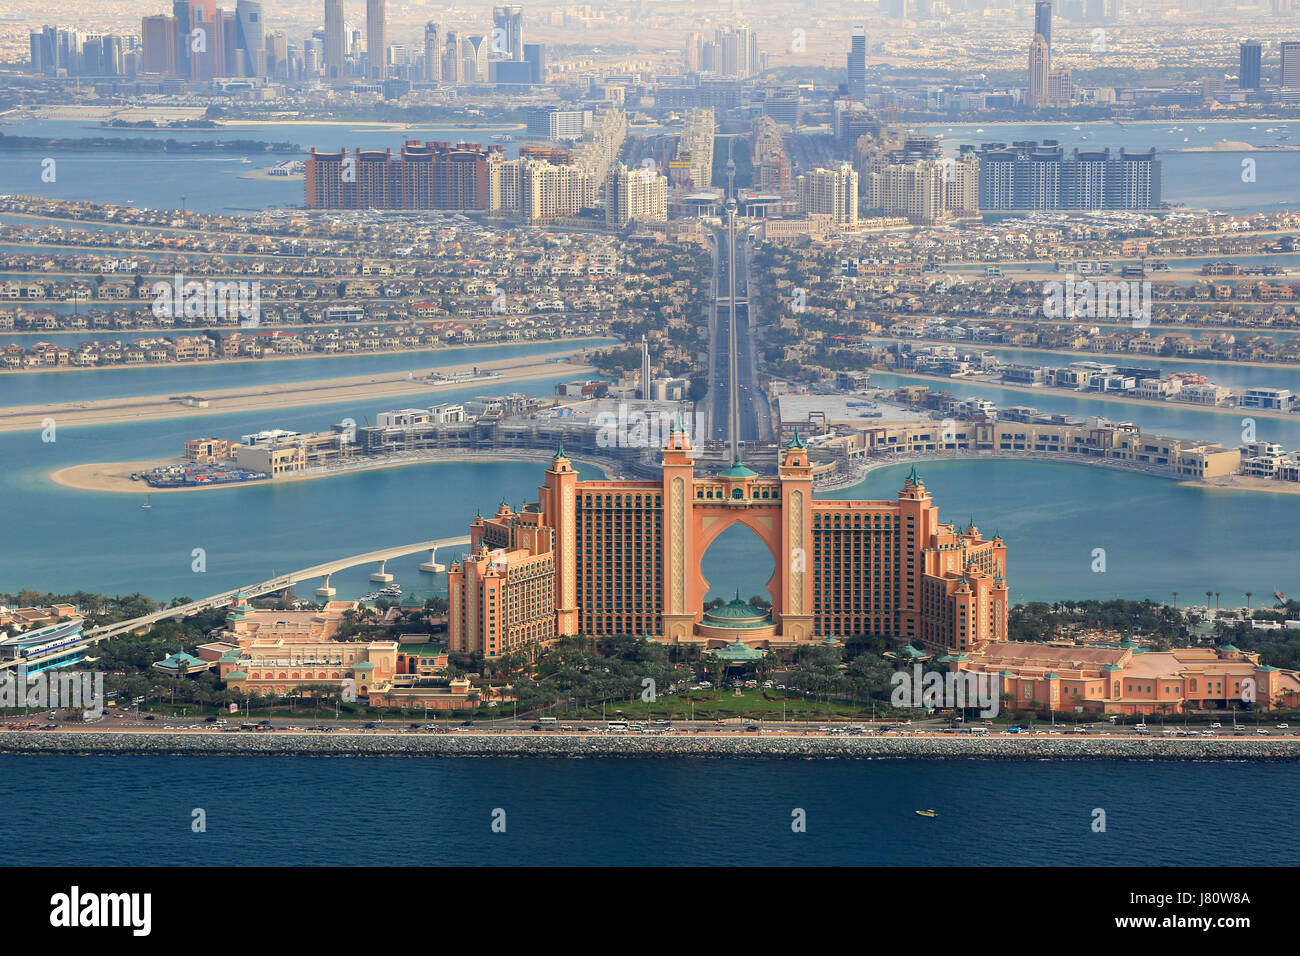 Dubai palm island atlantis hotel vista aerea fotografia emirati arabi uniti Immagini Stock